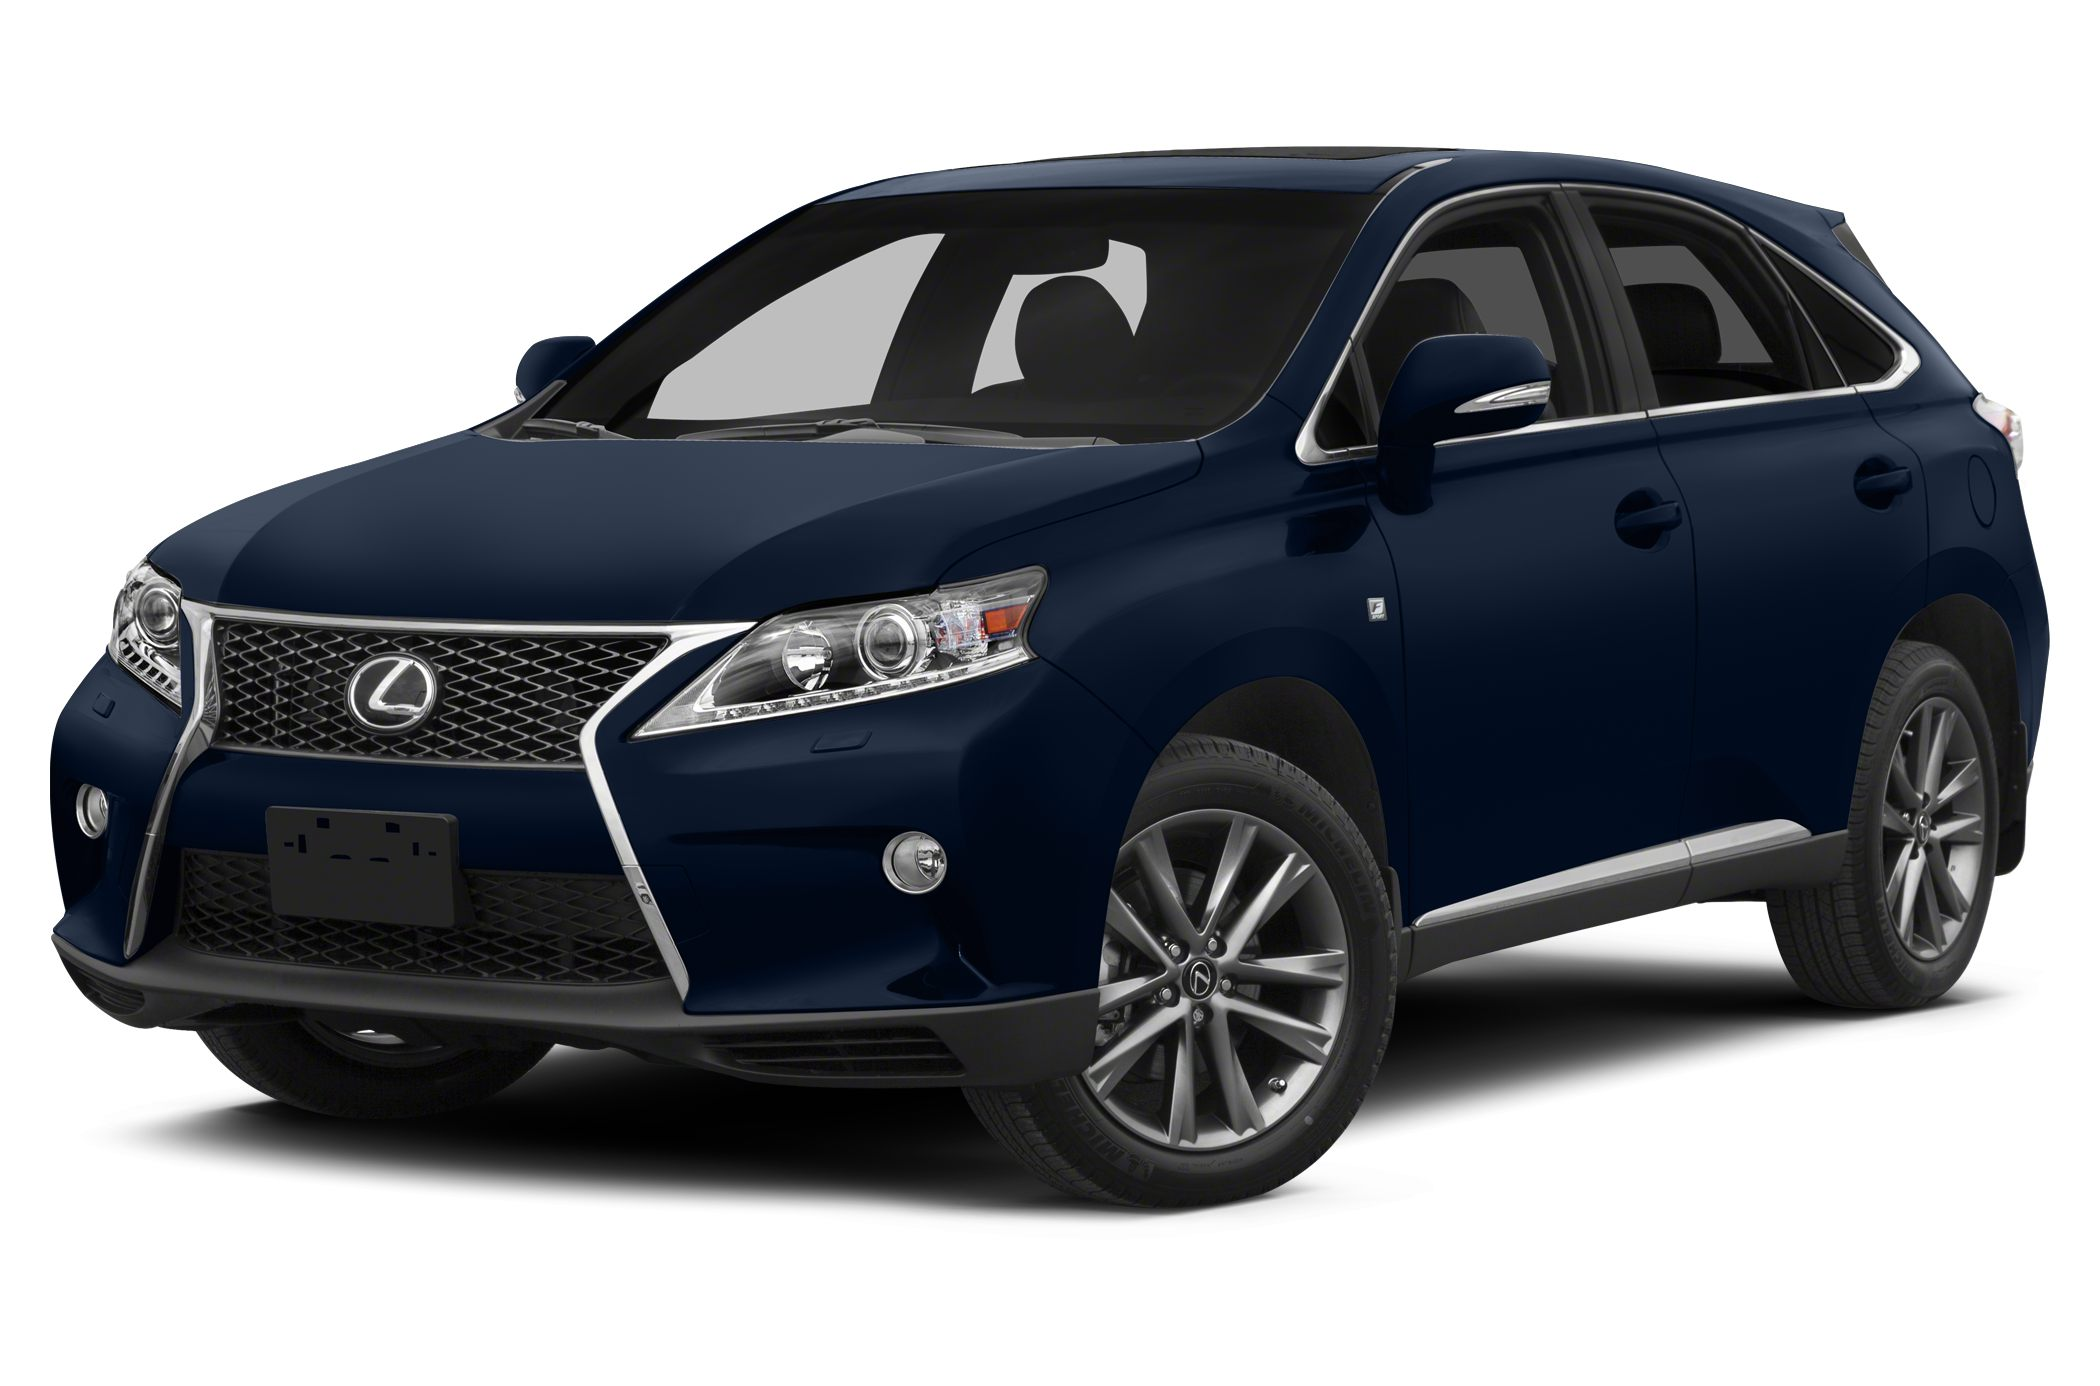 copart rx in auction lot title ended carfinder lexus auctions left en auto on austin tx salvage online vin view vehicle